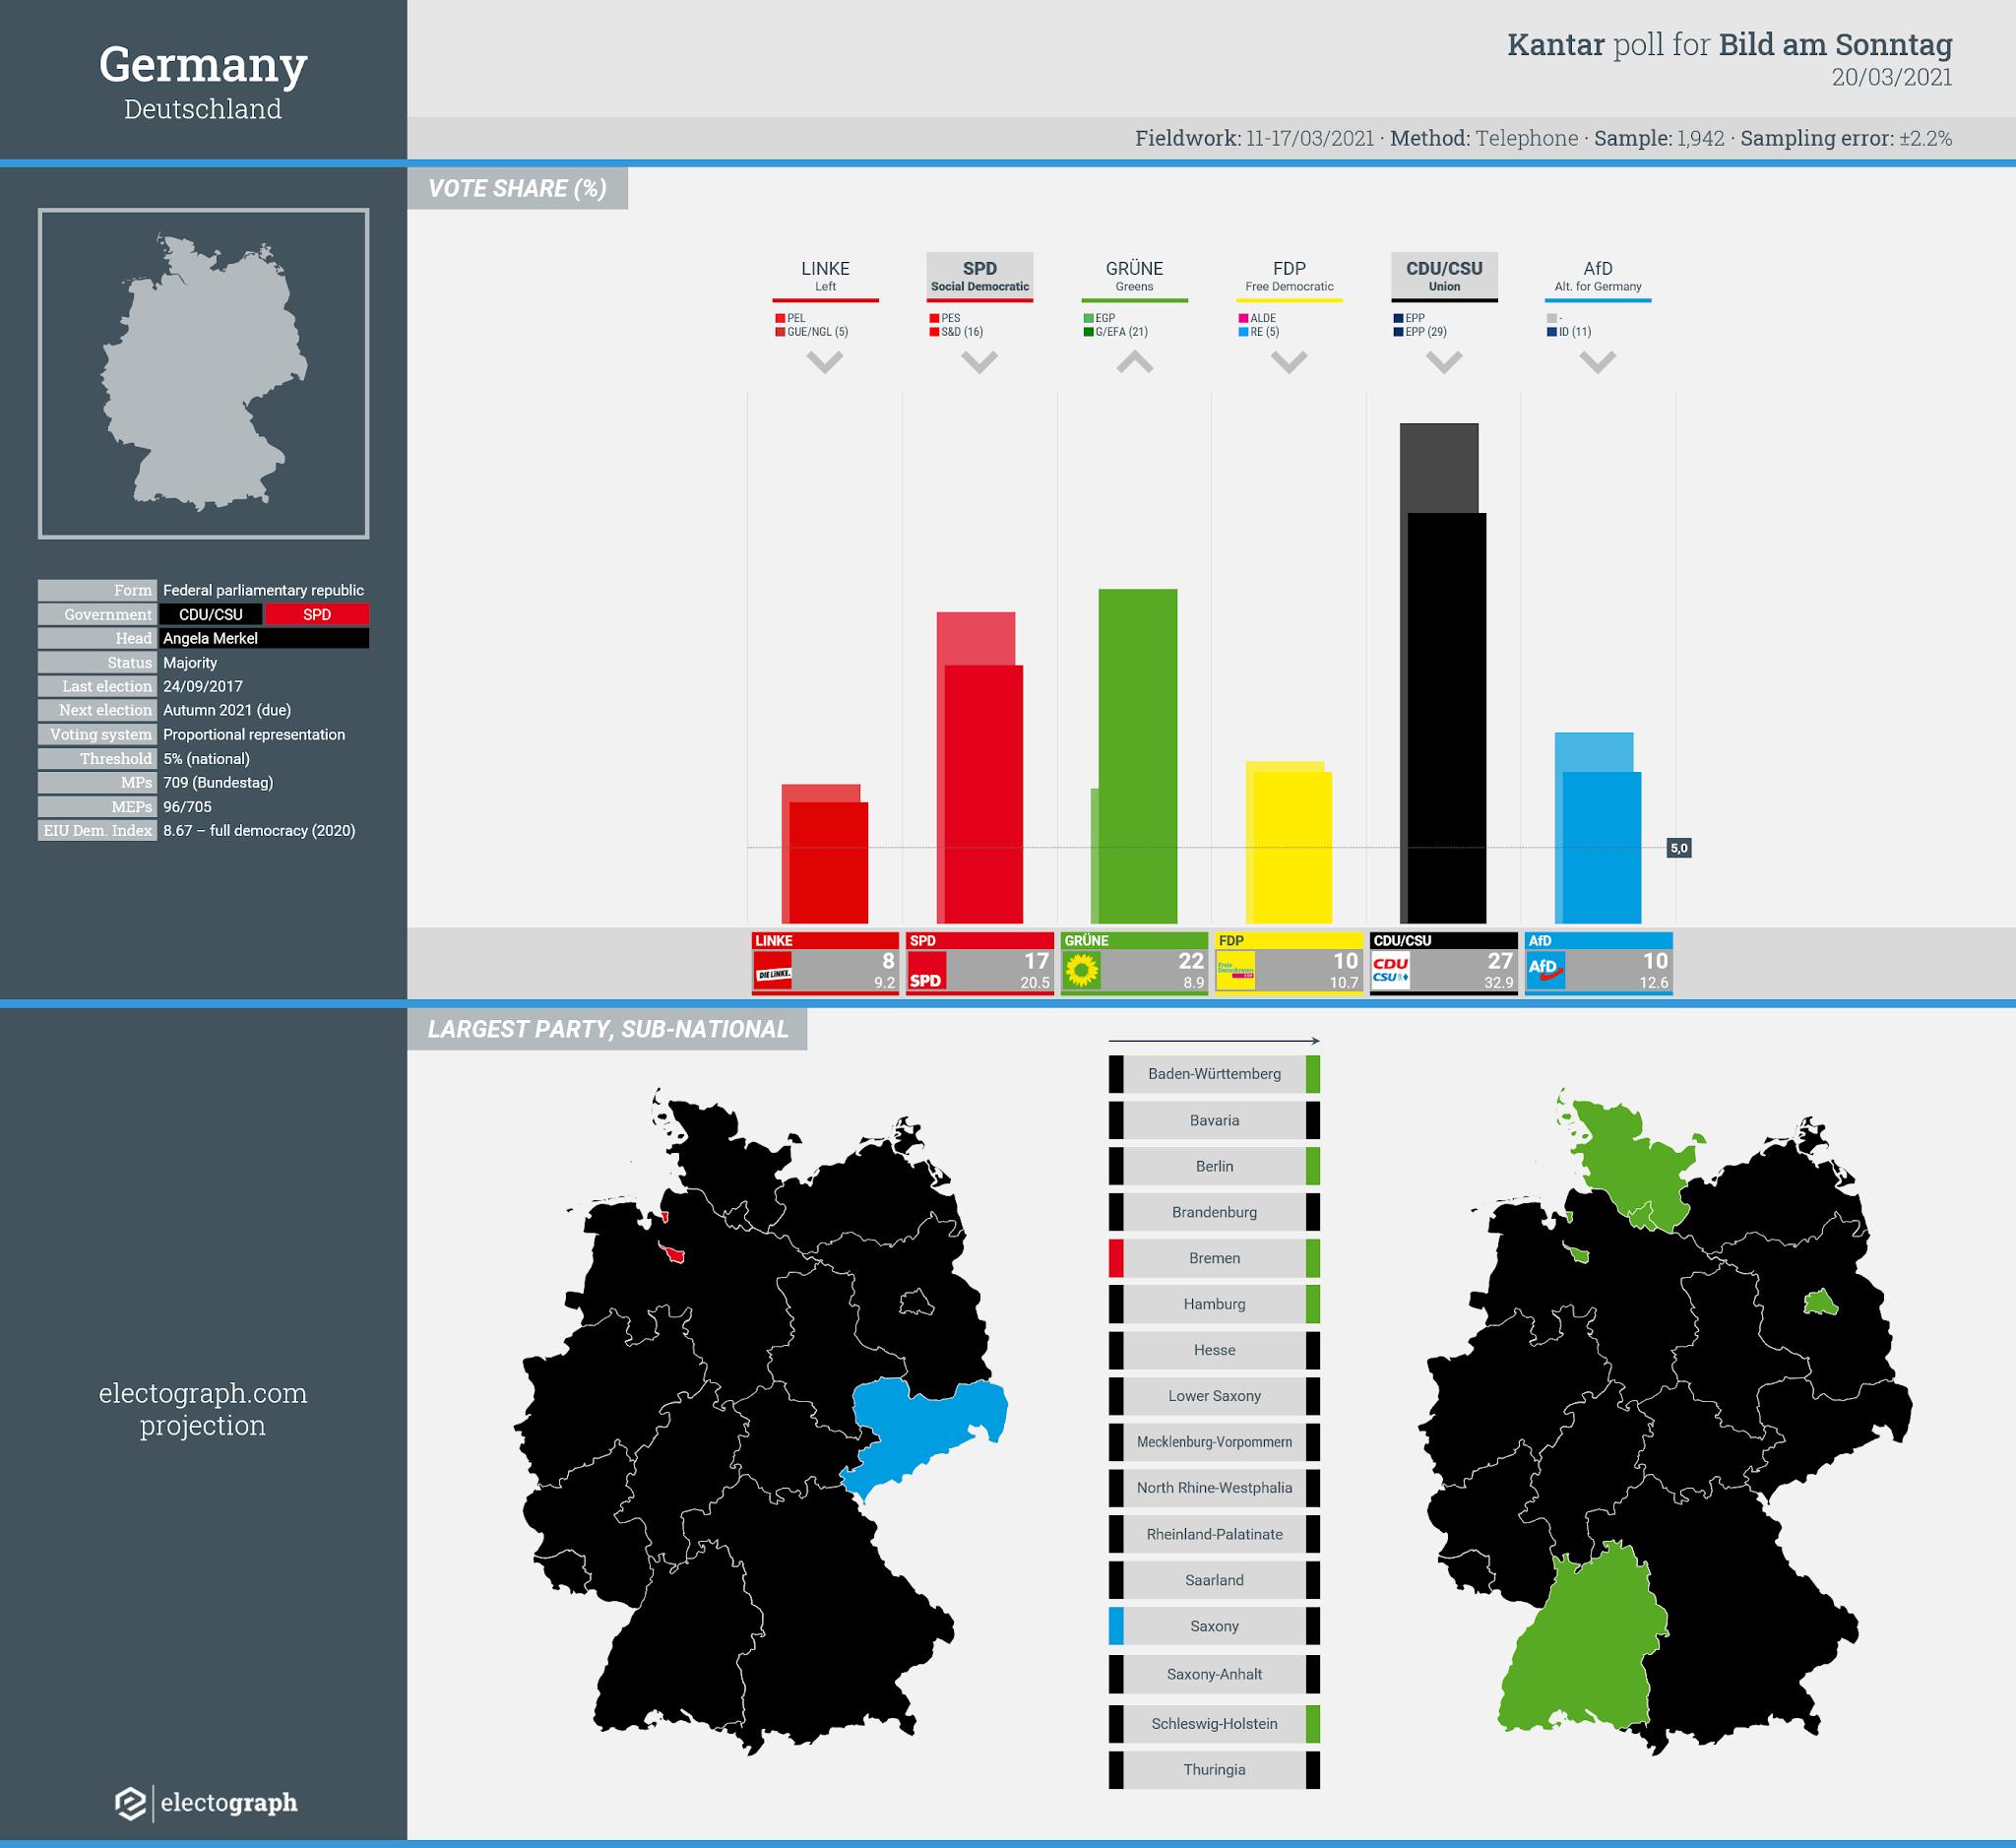 GERMANY: Kantar poll chart for Bild am Sonntag, 20 March 2021